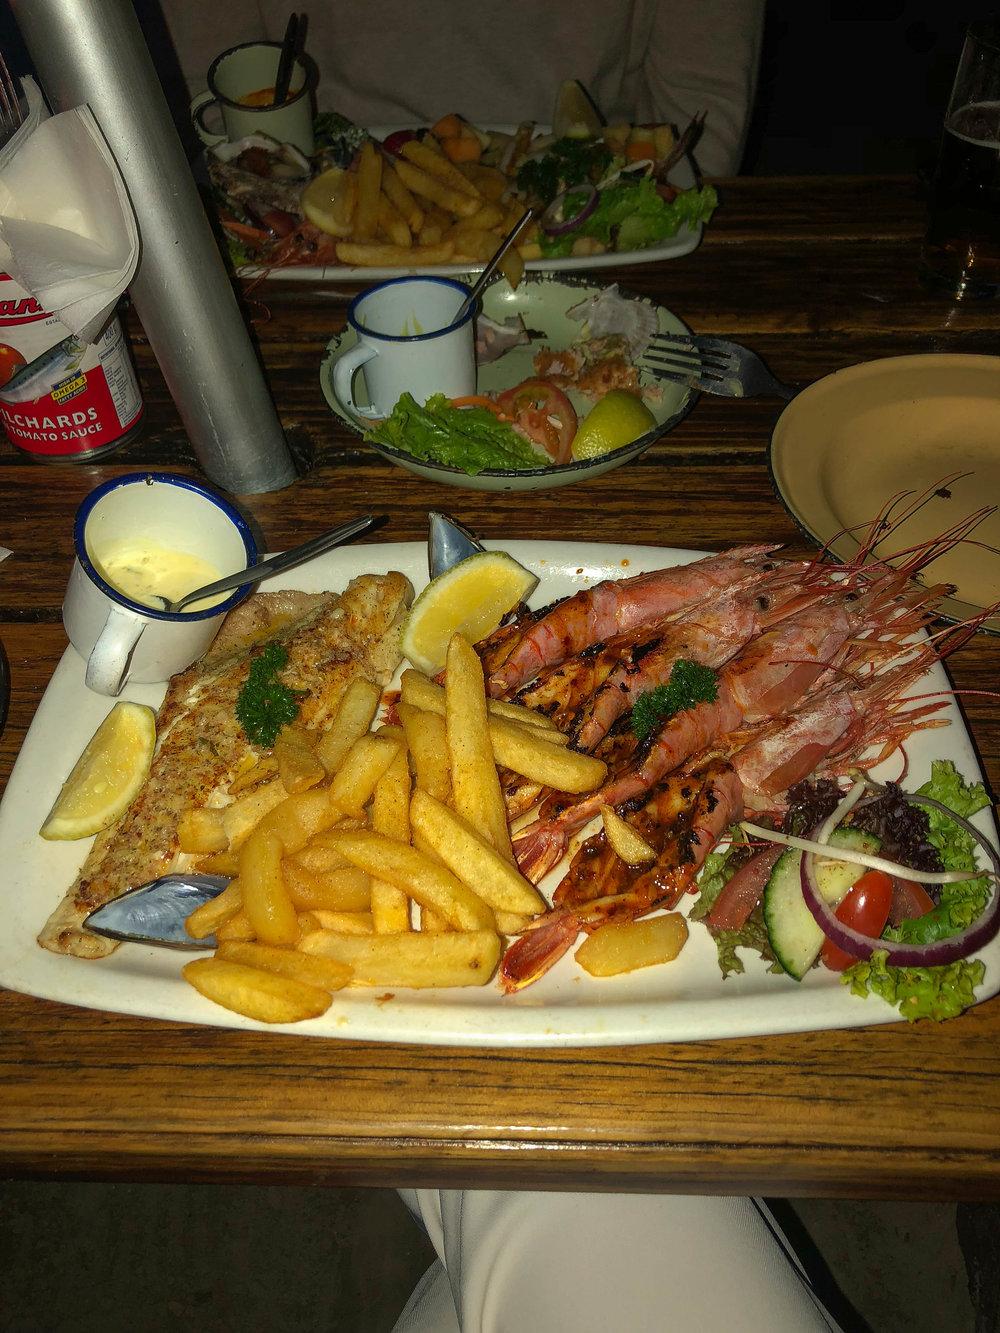 South Africa Travel Guide: Restaurant Knysna